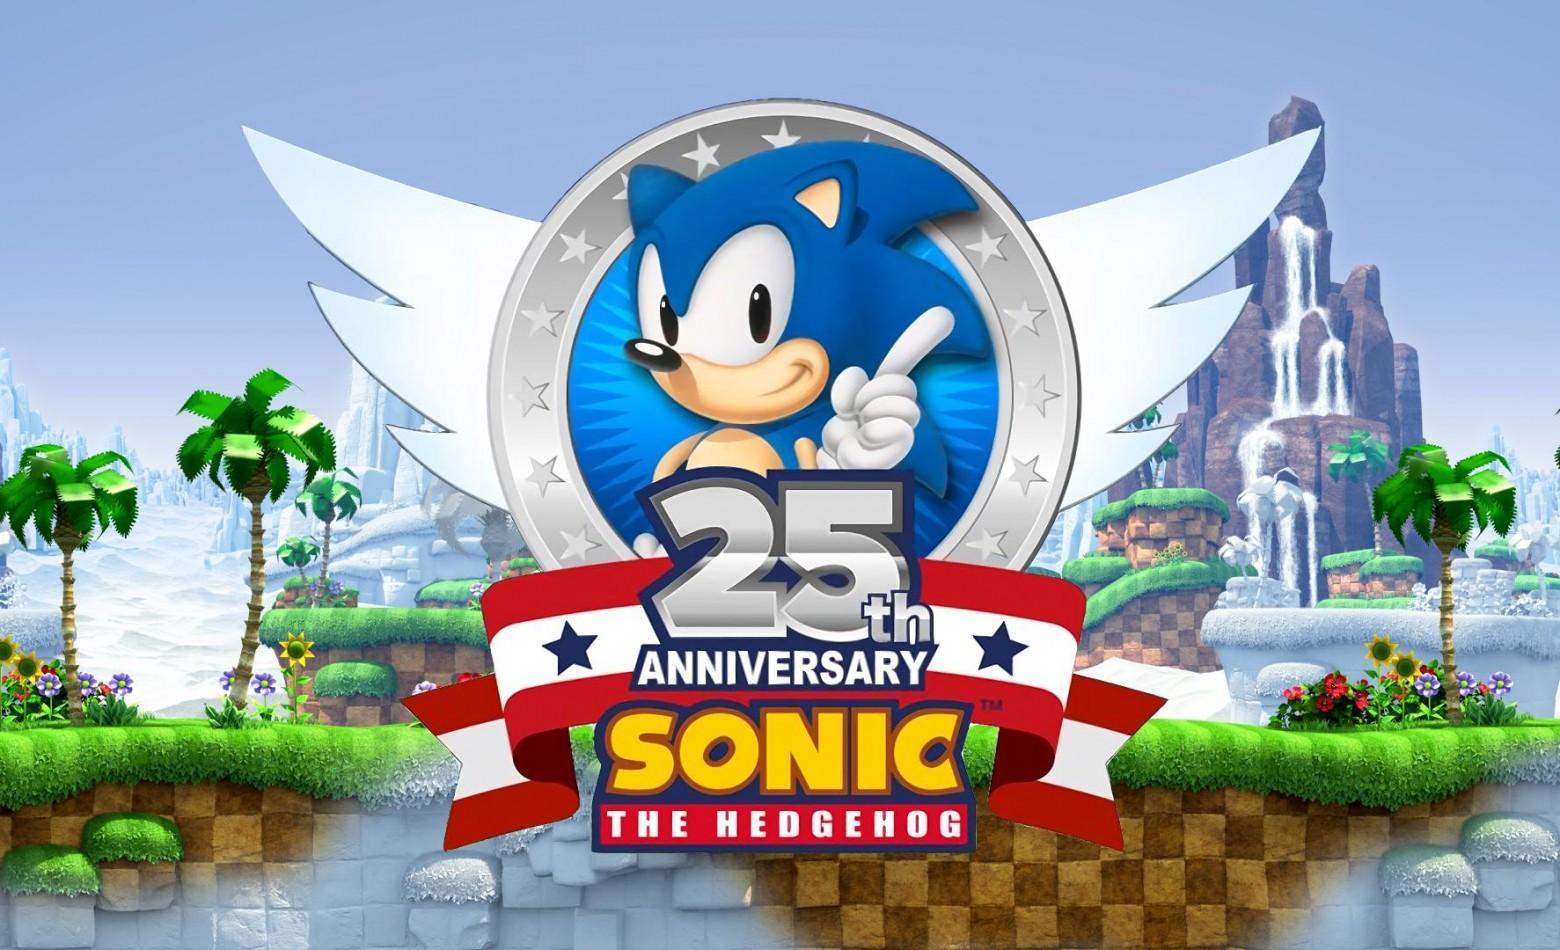 Sonic comemora 25 anos, e o que temos para celebrar?